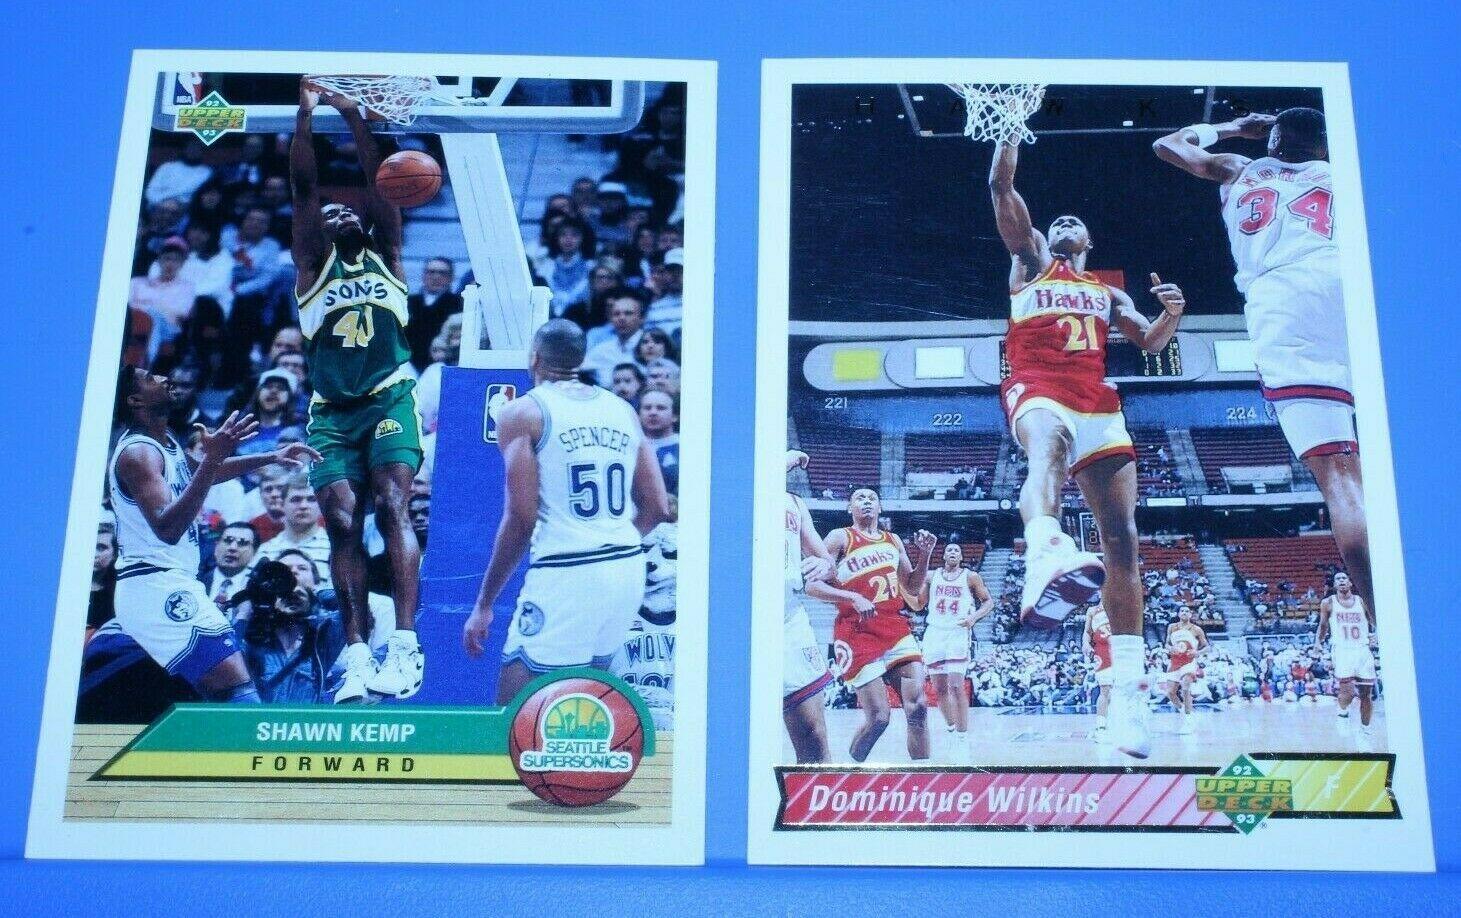 NBA superstars Shawn Kemp & Dominique Wilkins in MINT OR